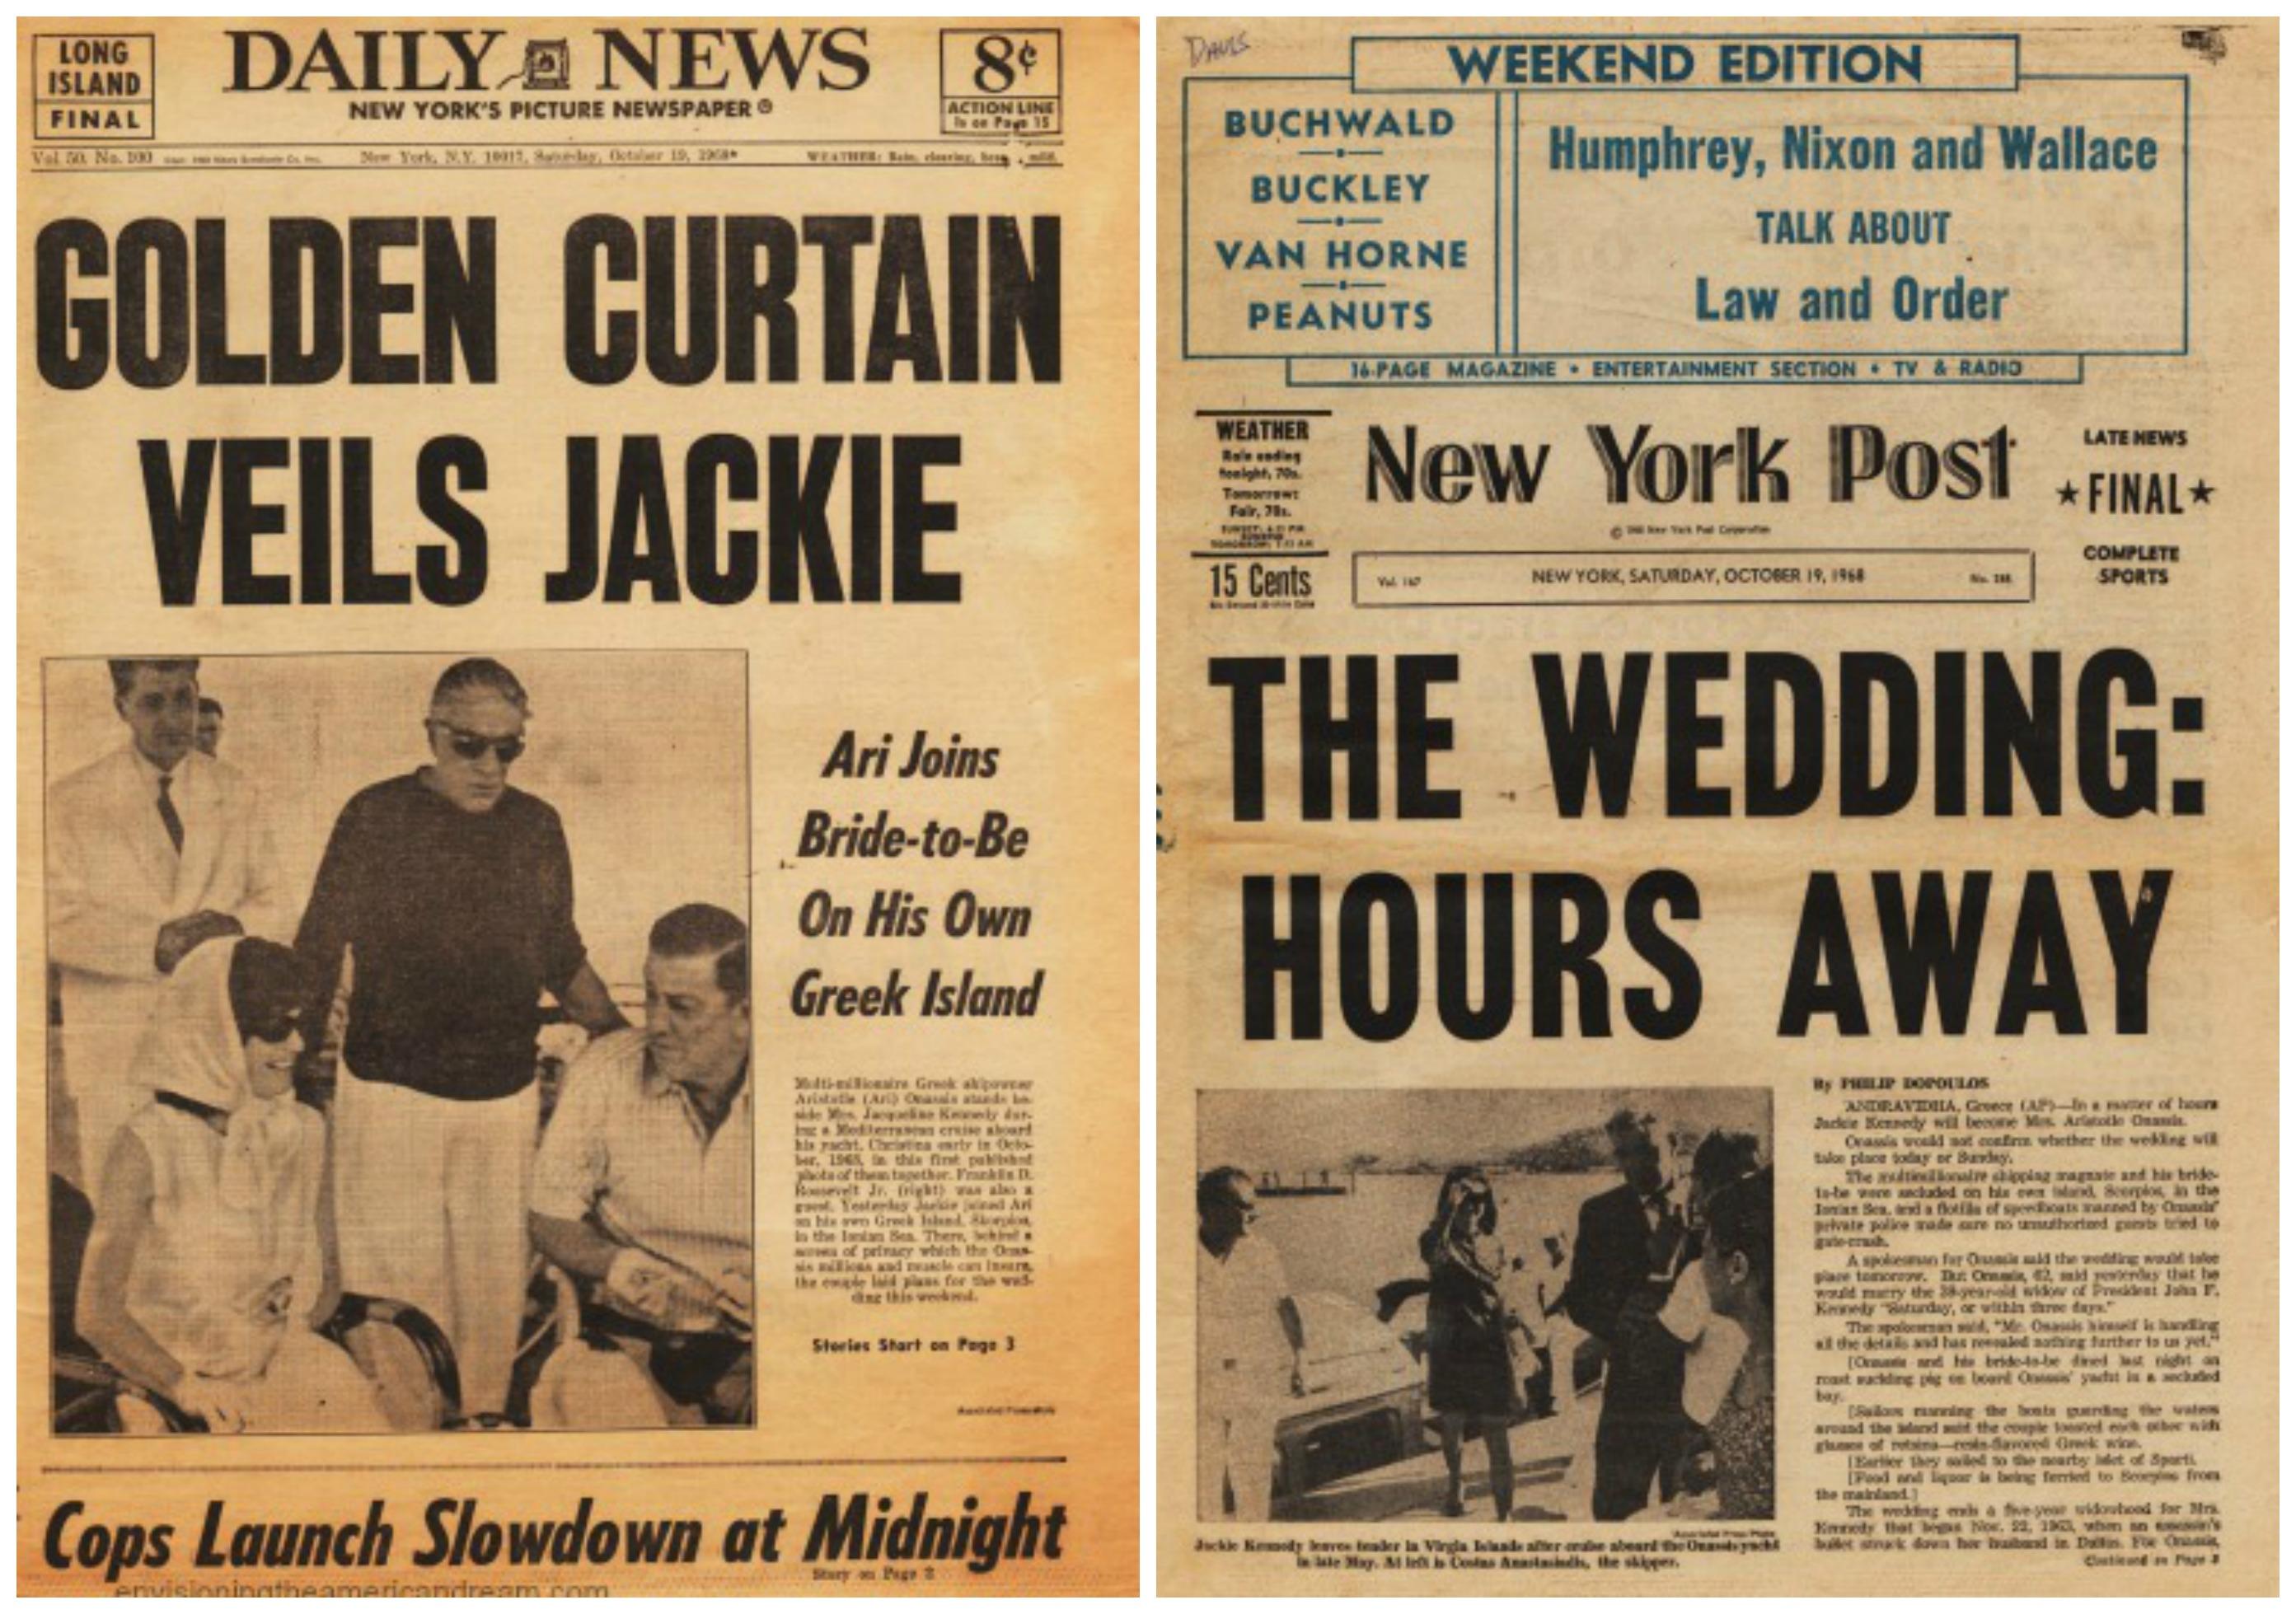 main functions of newspaper headlines